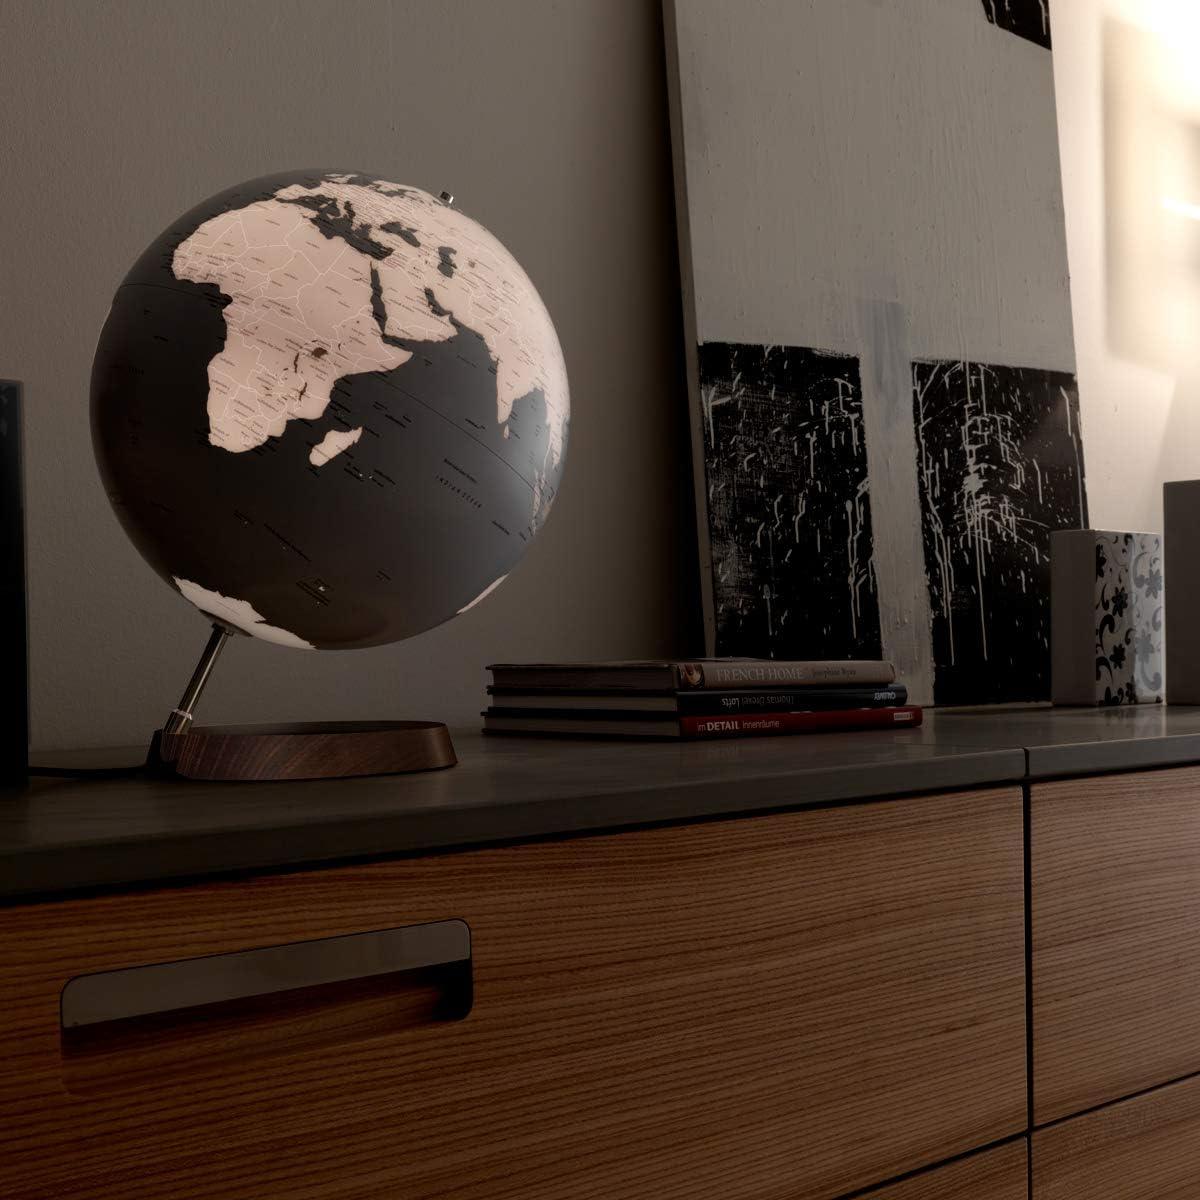 "Full Circle Reflection 12/"" Minimalist Designer Series Illuminated World Globe with Silver and White Design for Desk Office Home Decor Waypoint Geographic Light Up Decorative Globe Bookshelves"